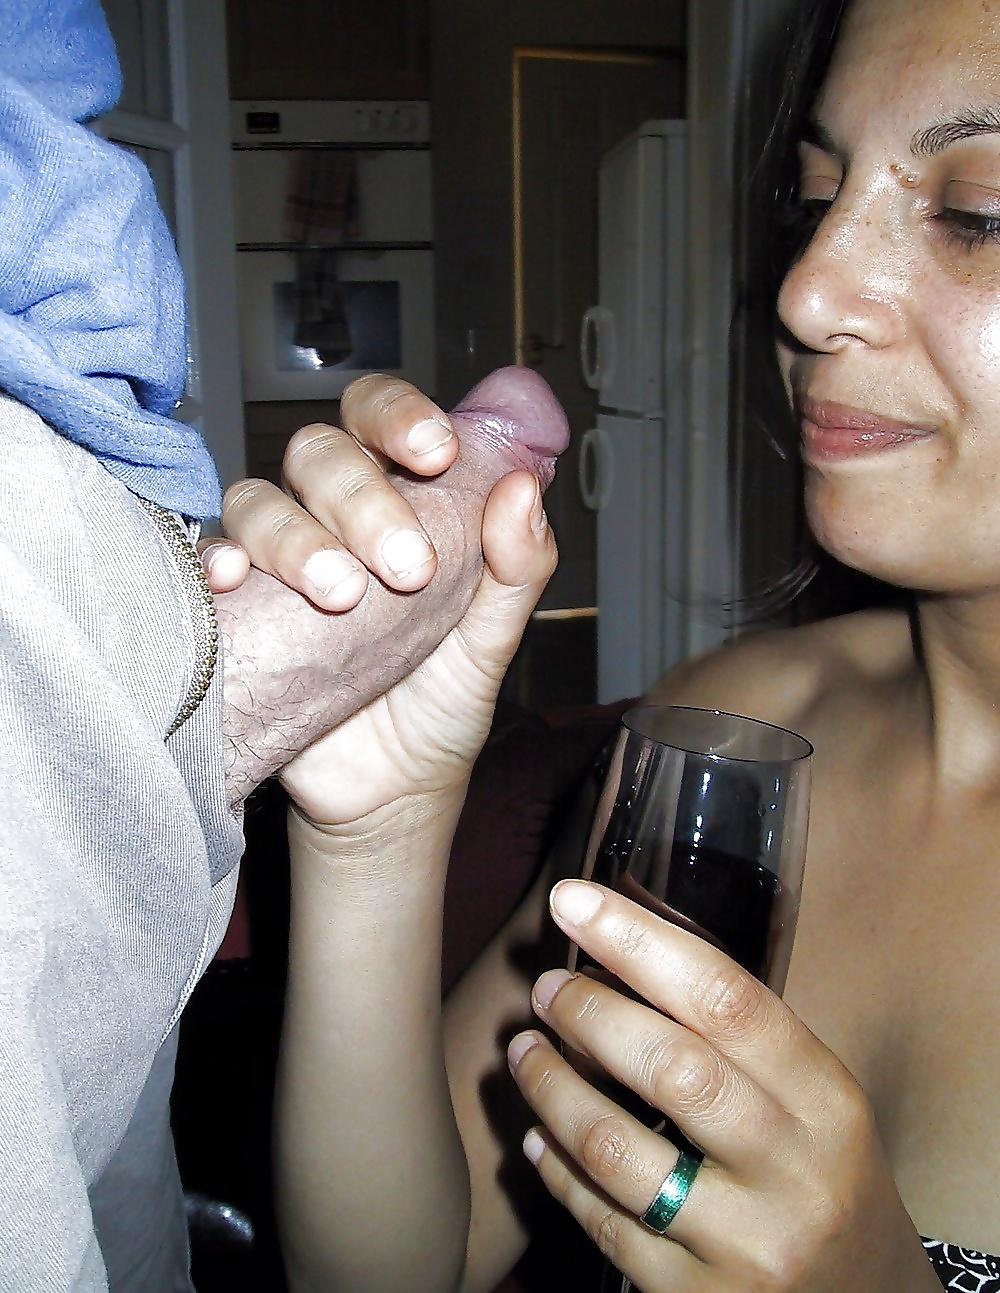 Masturabtion amateur cool wife hand